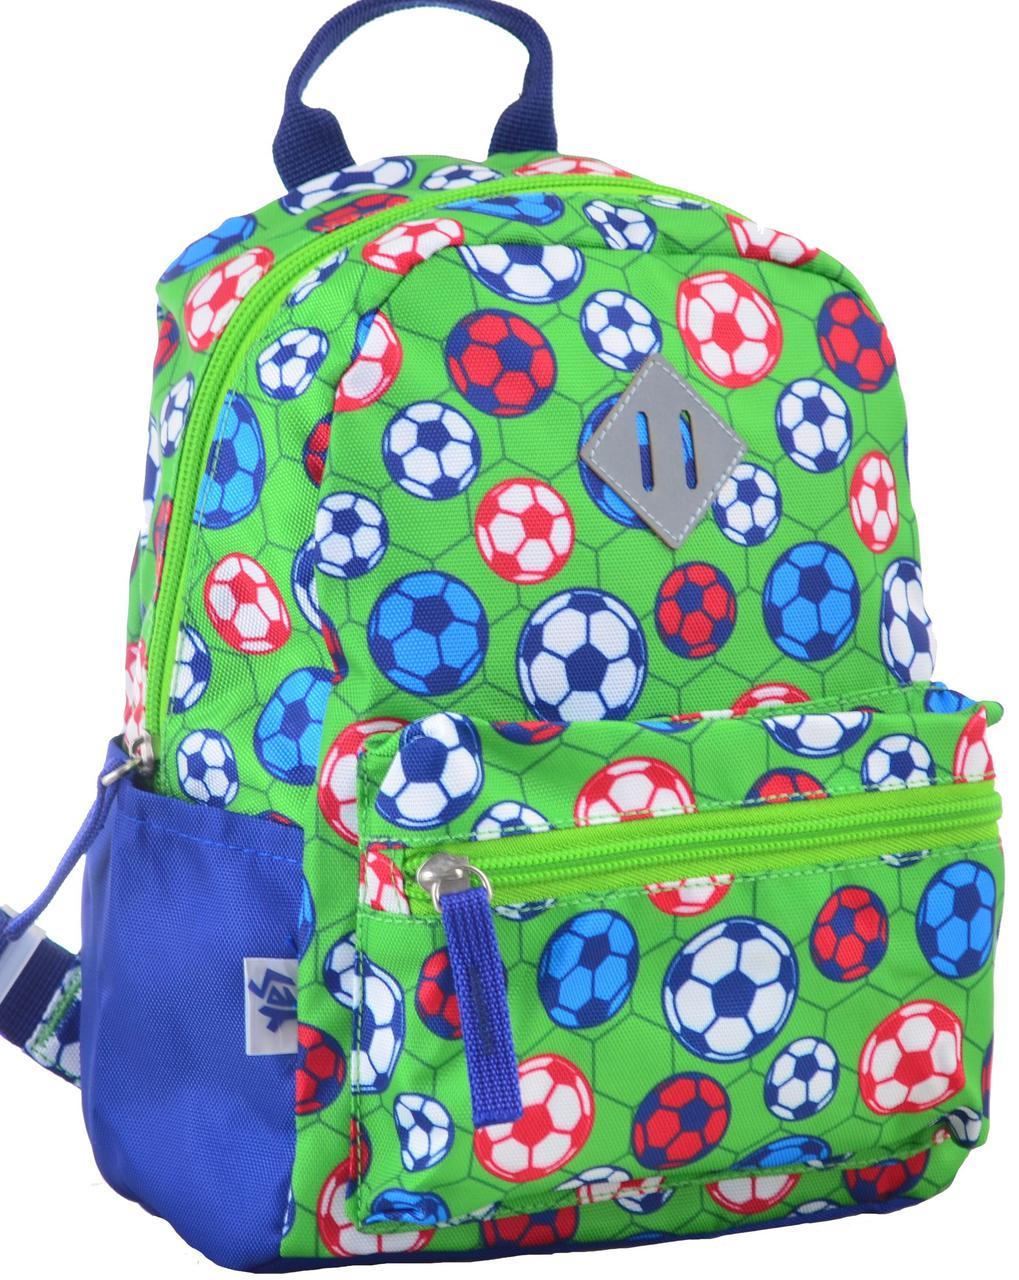 Рюкзак детский Yes! K-19 Football 555311 5 л Зеленый